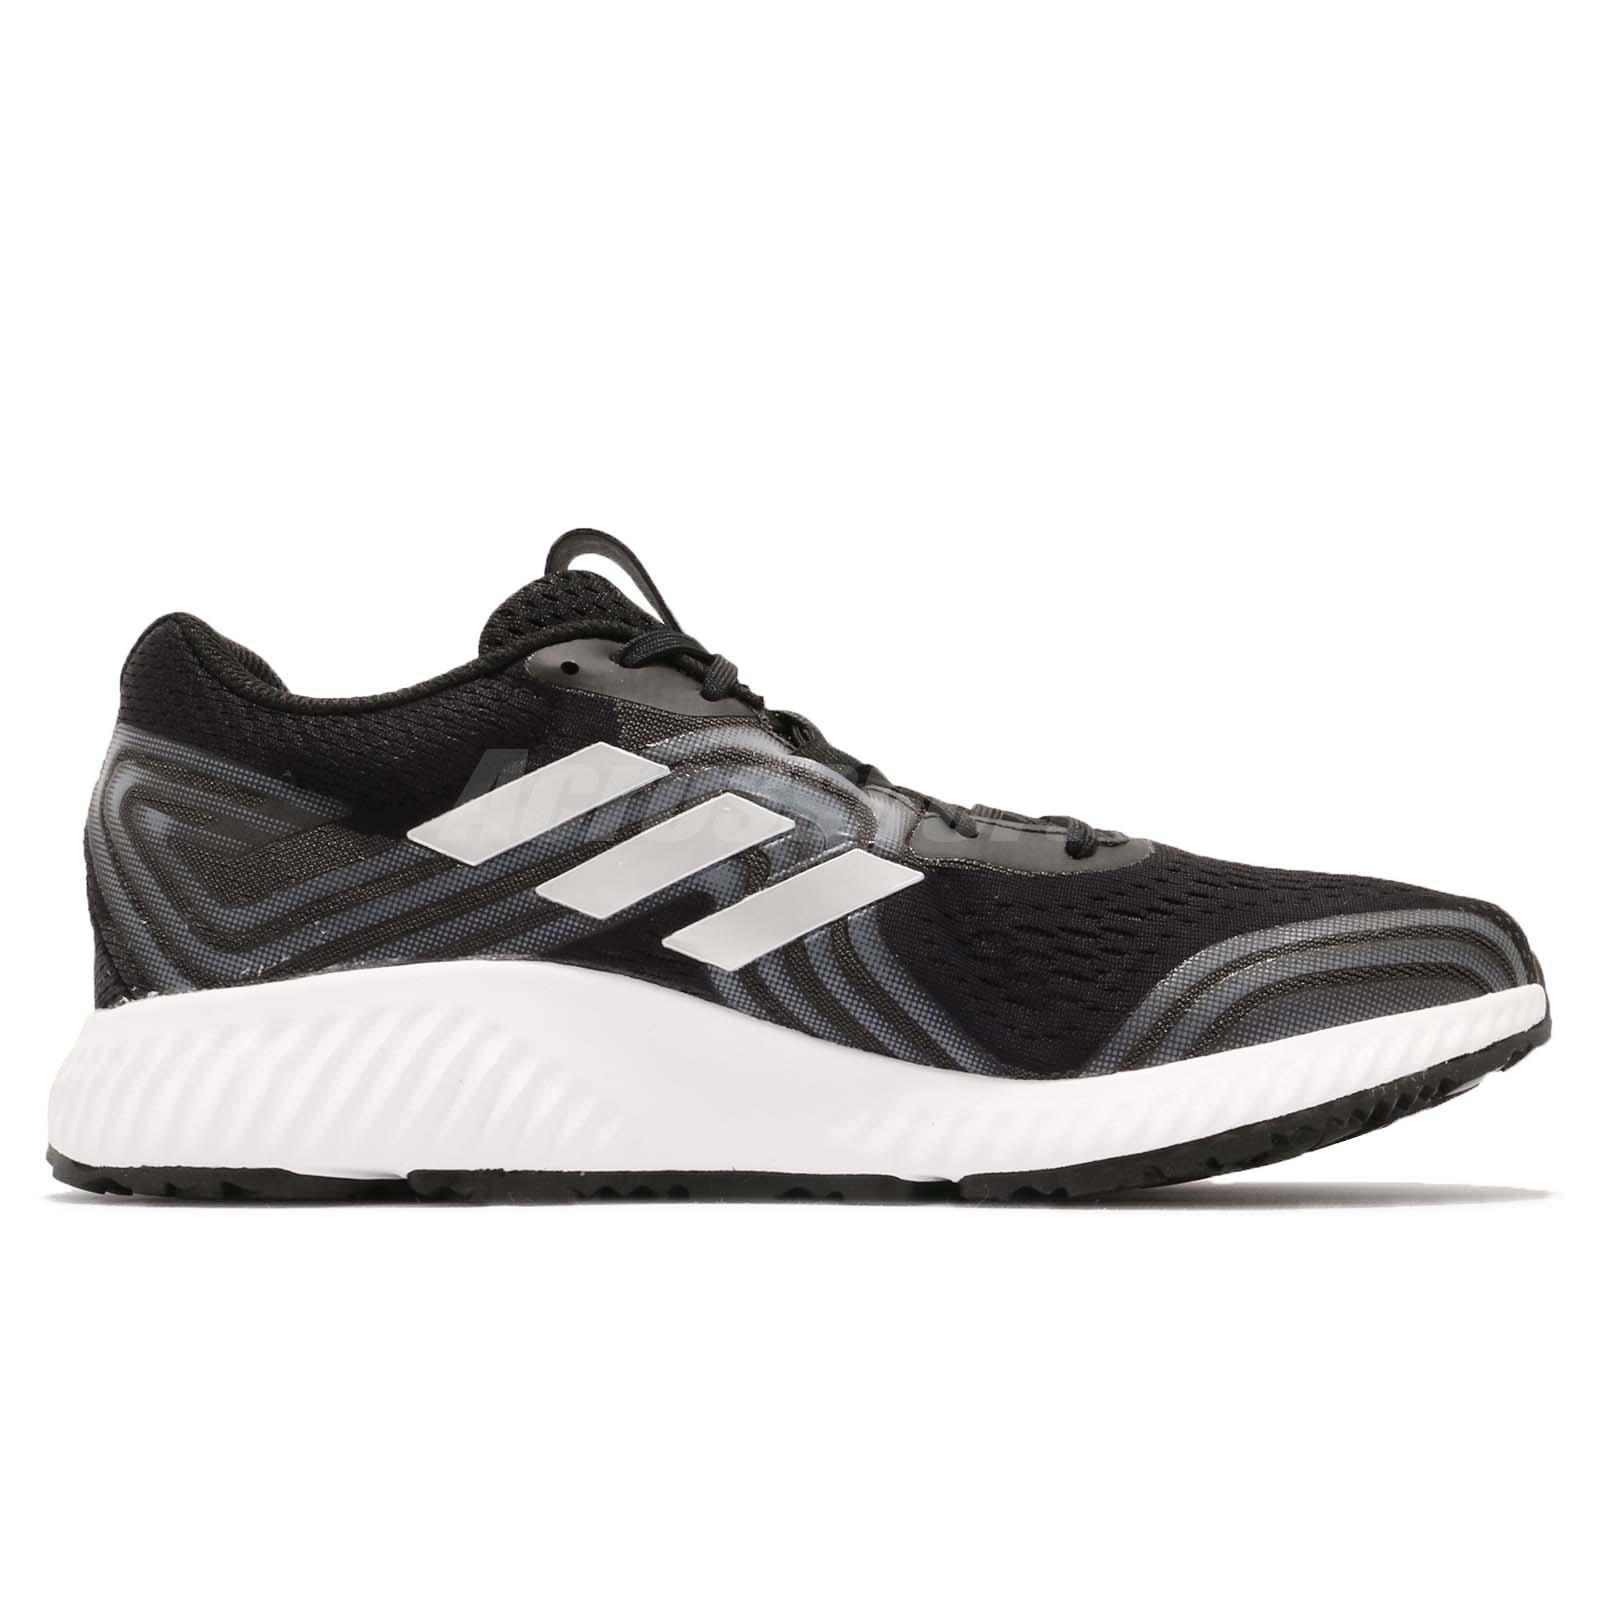 adidas Aerobounce 2 M Black Silver Aqua White Men Running Shoes ... 4f8a60b11